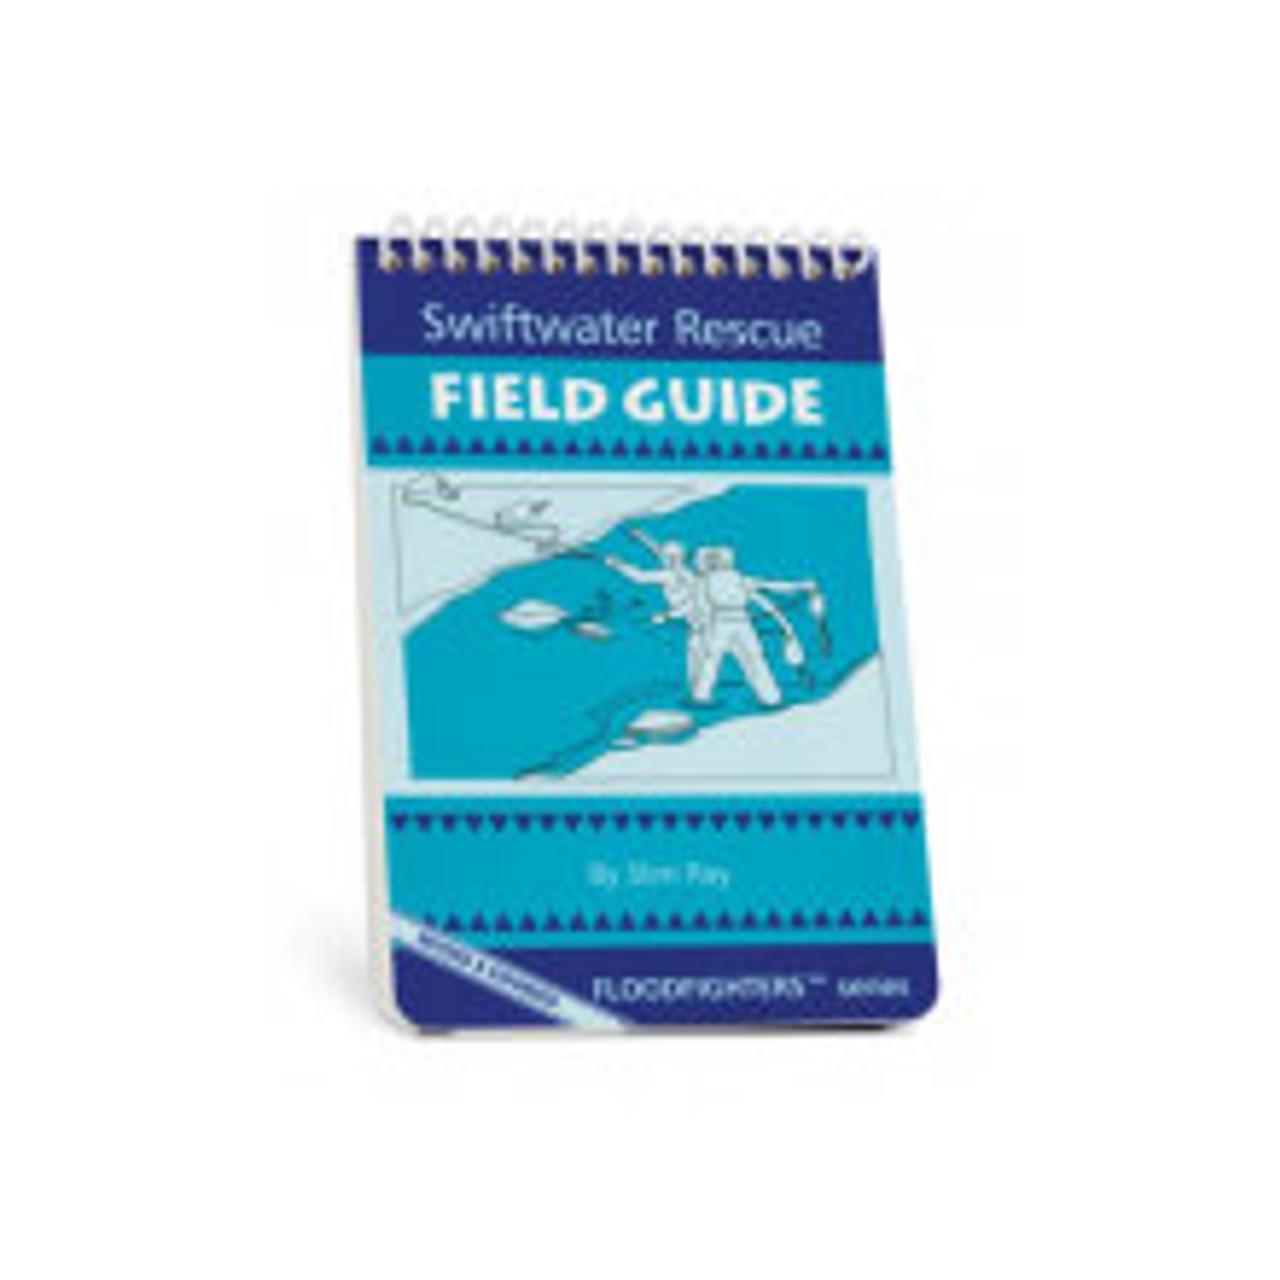 Swiftwater Rescue Field Guide